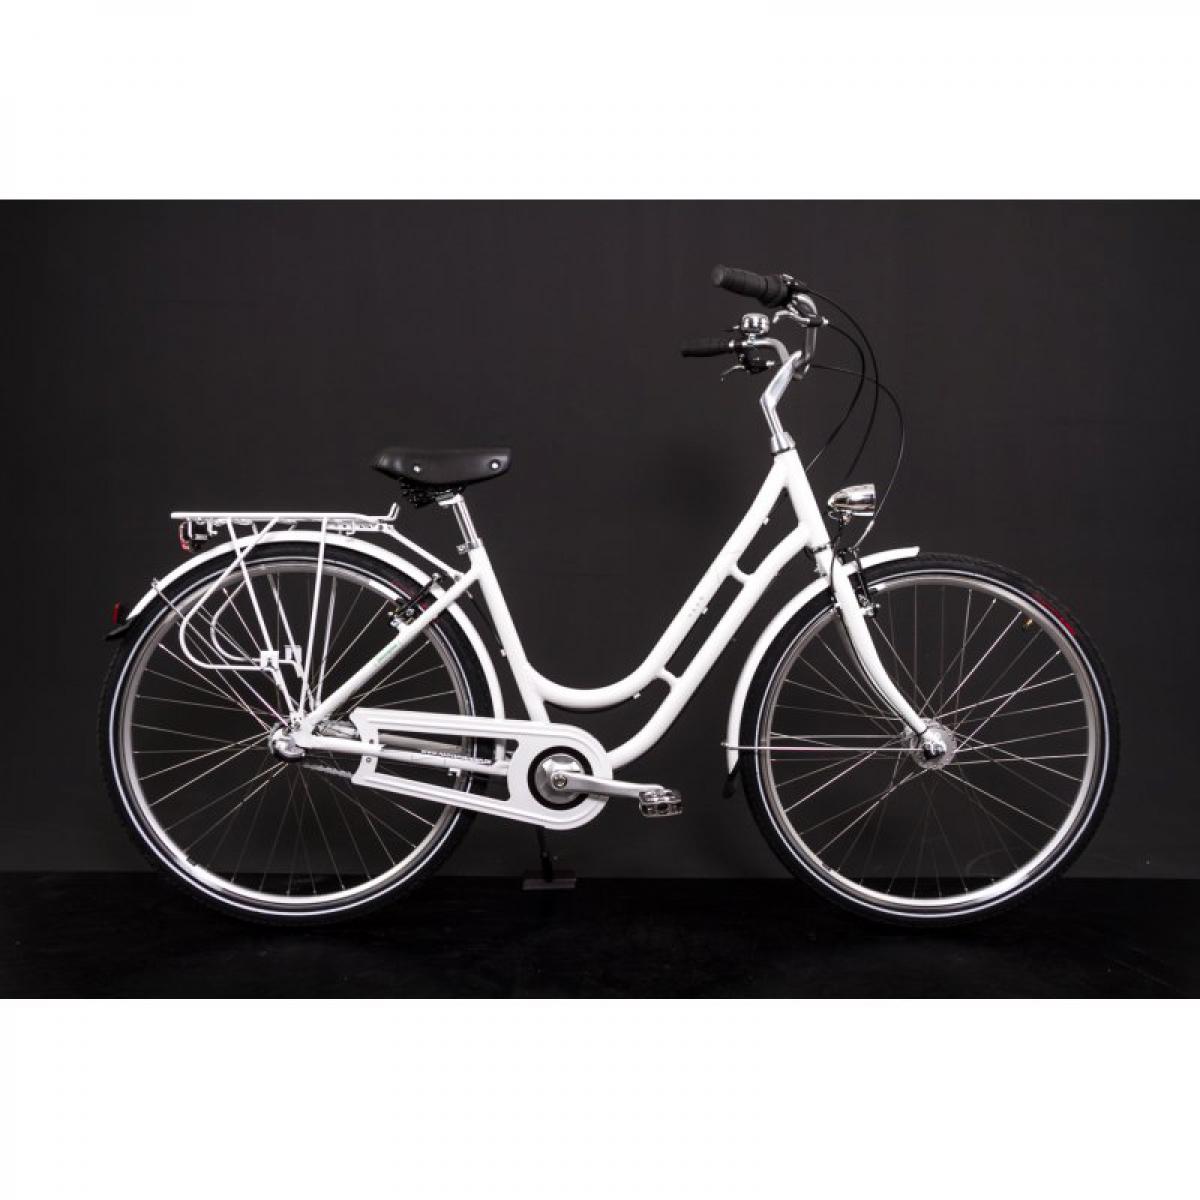 leichtes 28 zoll mifa damen classic retro nostalgie fahrrad shimano 3 gang wei ihr fahrrad. Black Bedroom Furniture Sets. Home Design Ideas